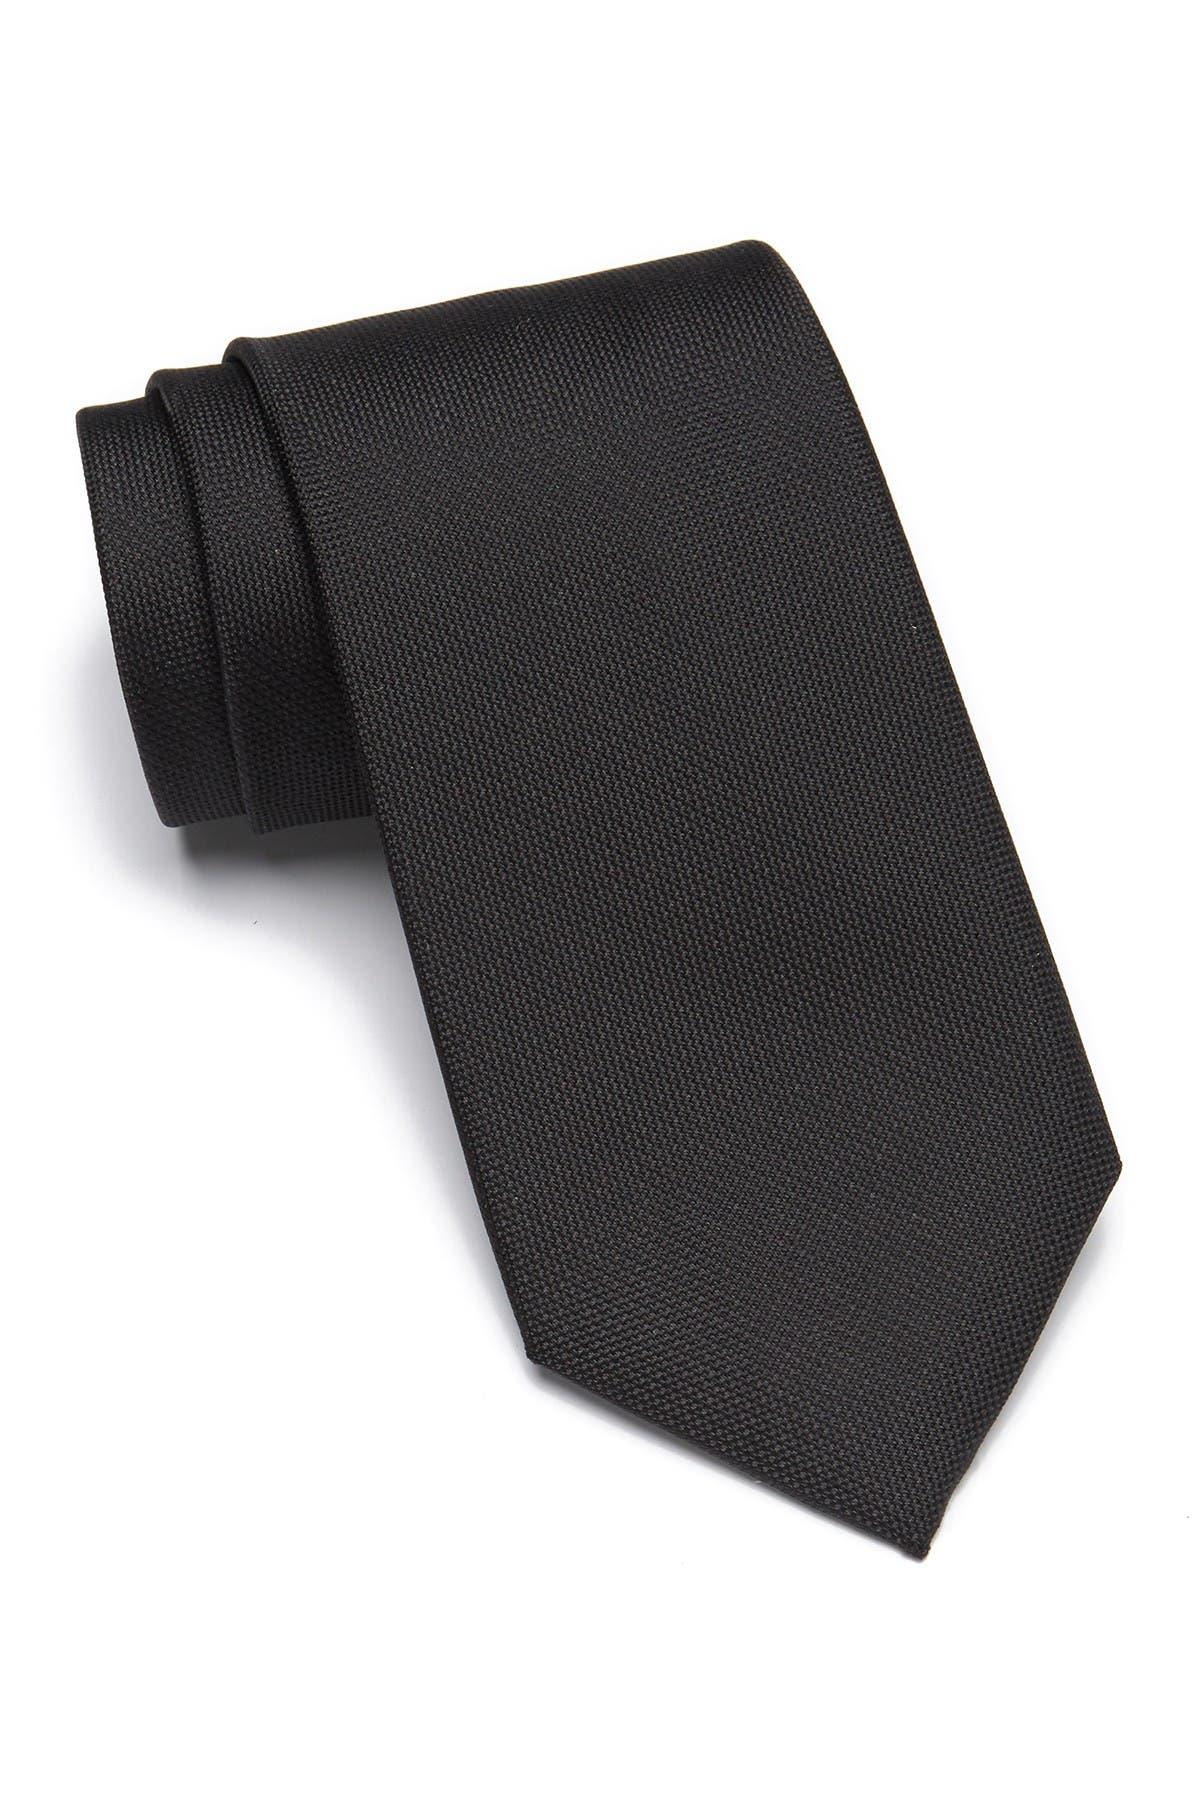 Image of Calvin Klein Silver Spun Solid Silk Tie